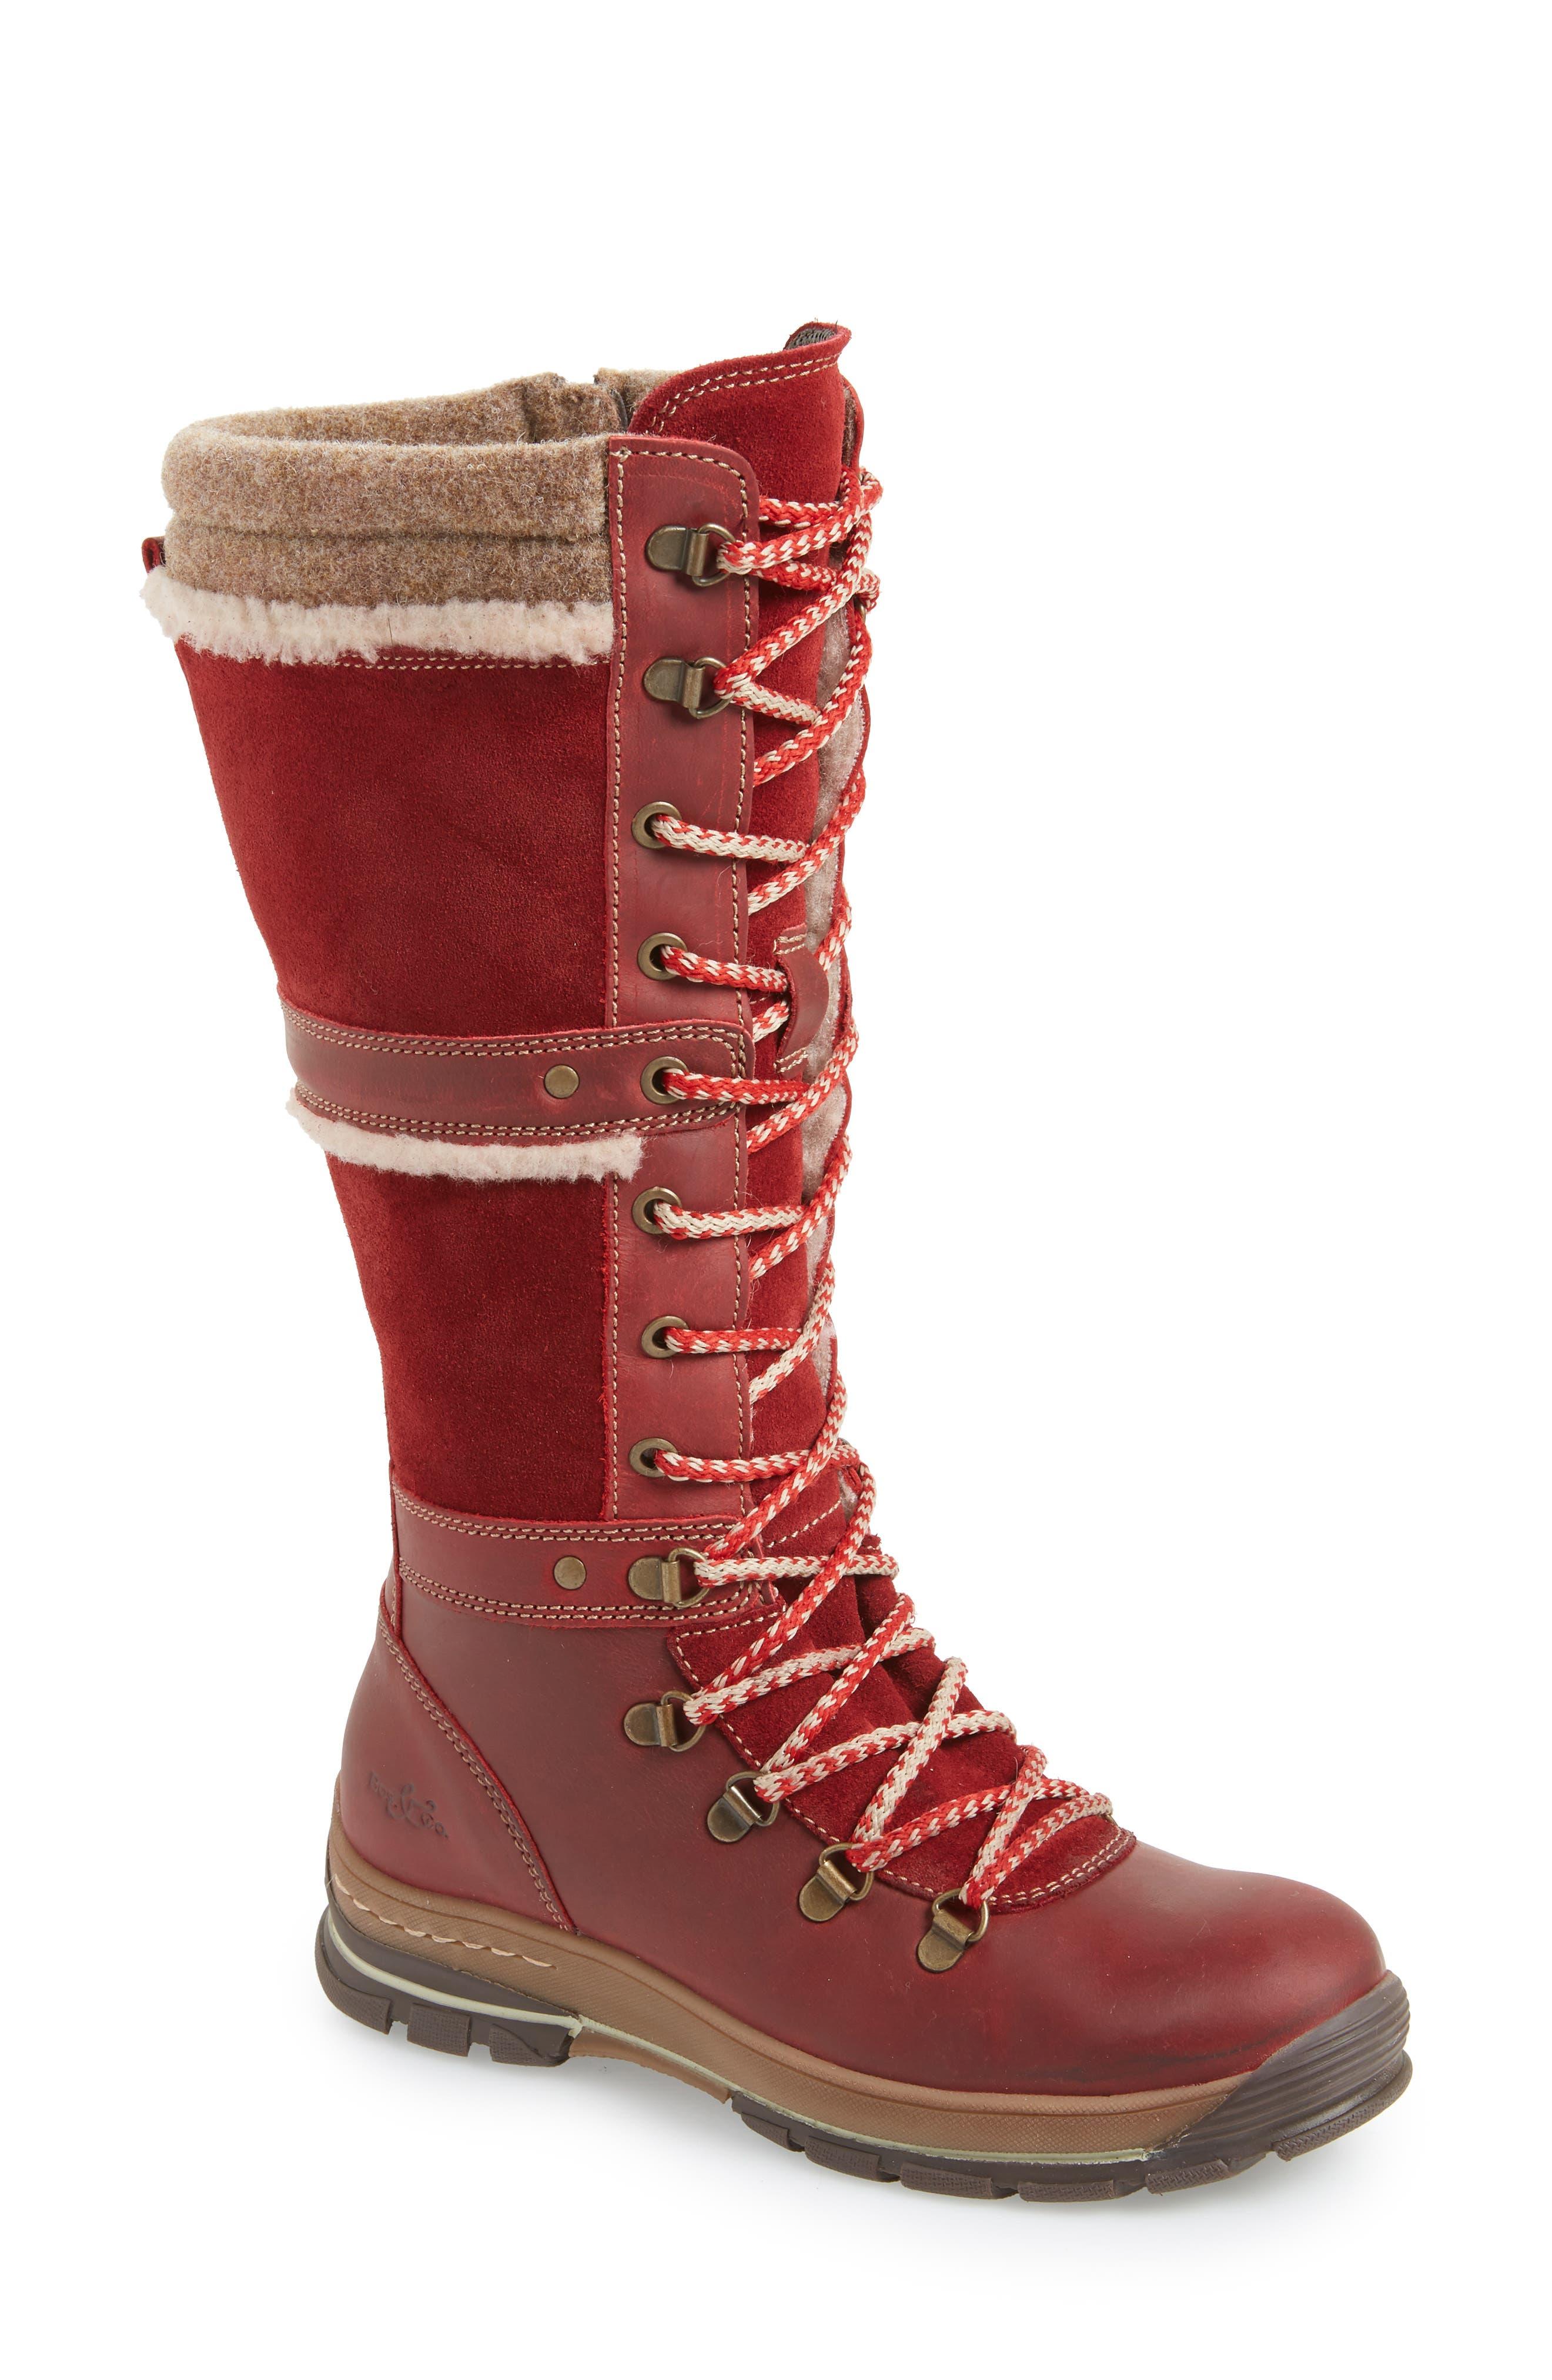 Bos. & Co. Gabriella Waterproof Boot, Red